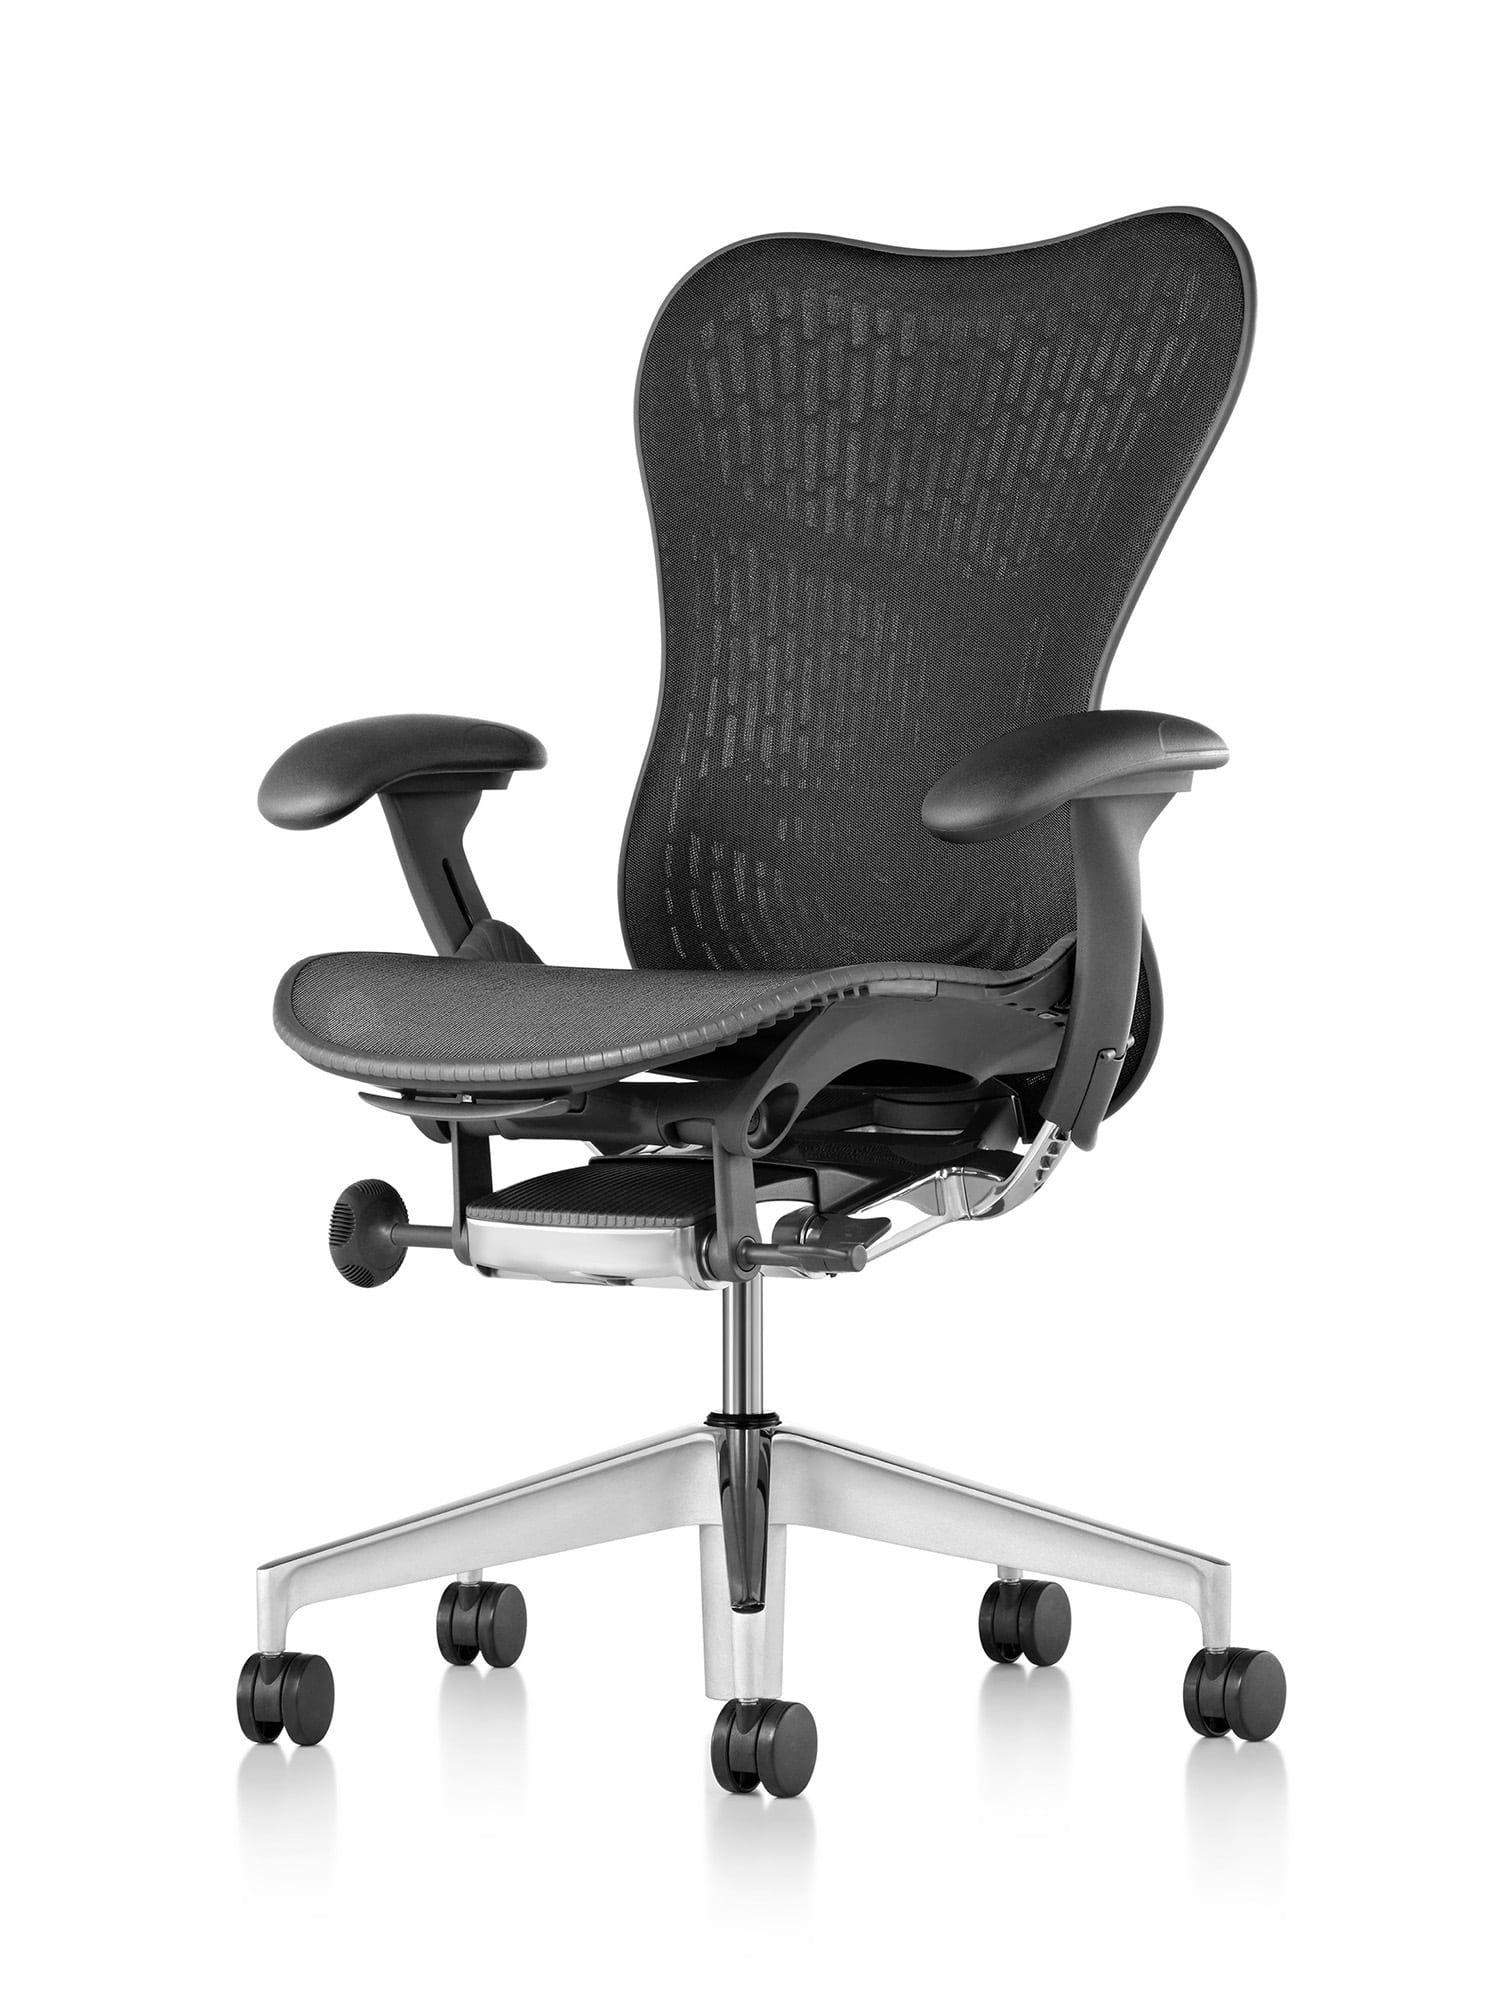 mirra 2 chair interior design projects ergonomic office chair rh pinterest com